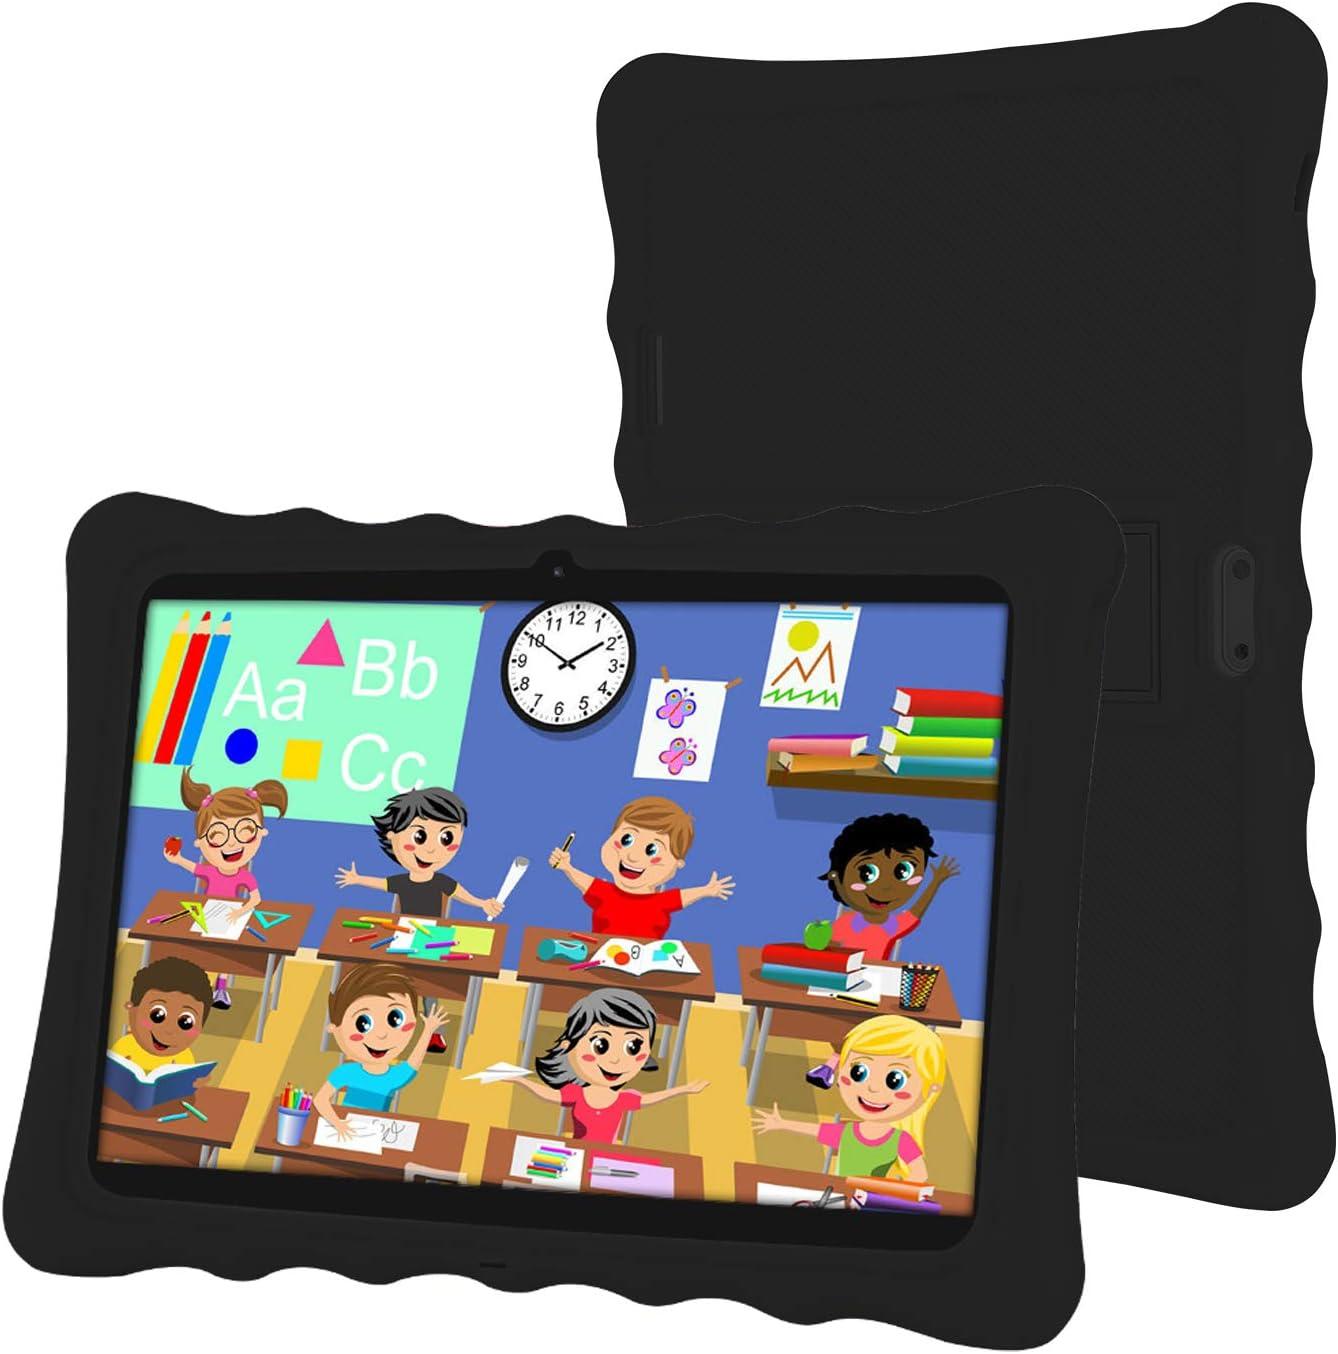 Tableta 10 Pulgadas,LAMZIEN Android 8.1 Tablet Infantil,2GB RAM y 32GB ROM,Quad-Core 1.8Ghz,3G Dual-Sim,Wifi, Bluetooth,Cámara Dual,Google Play,Juegos Educativos,Negro